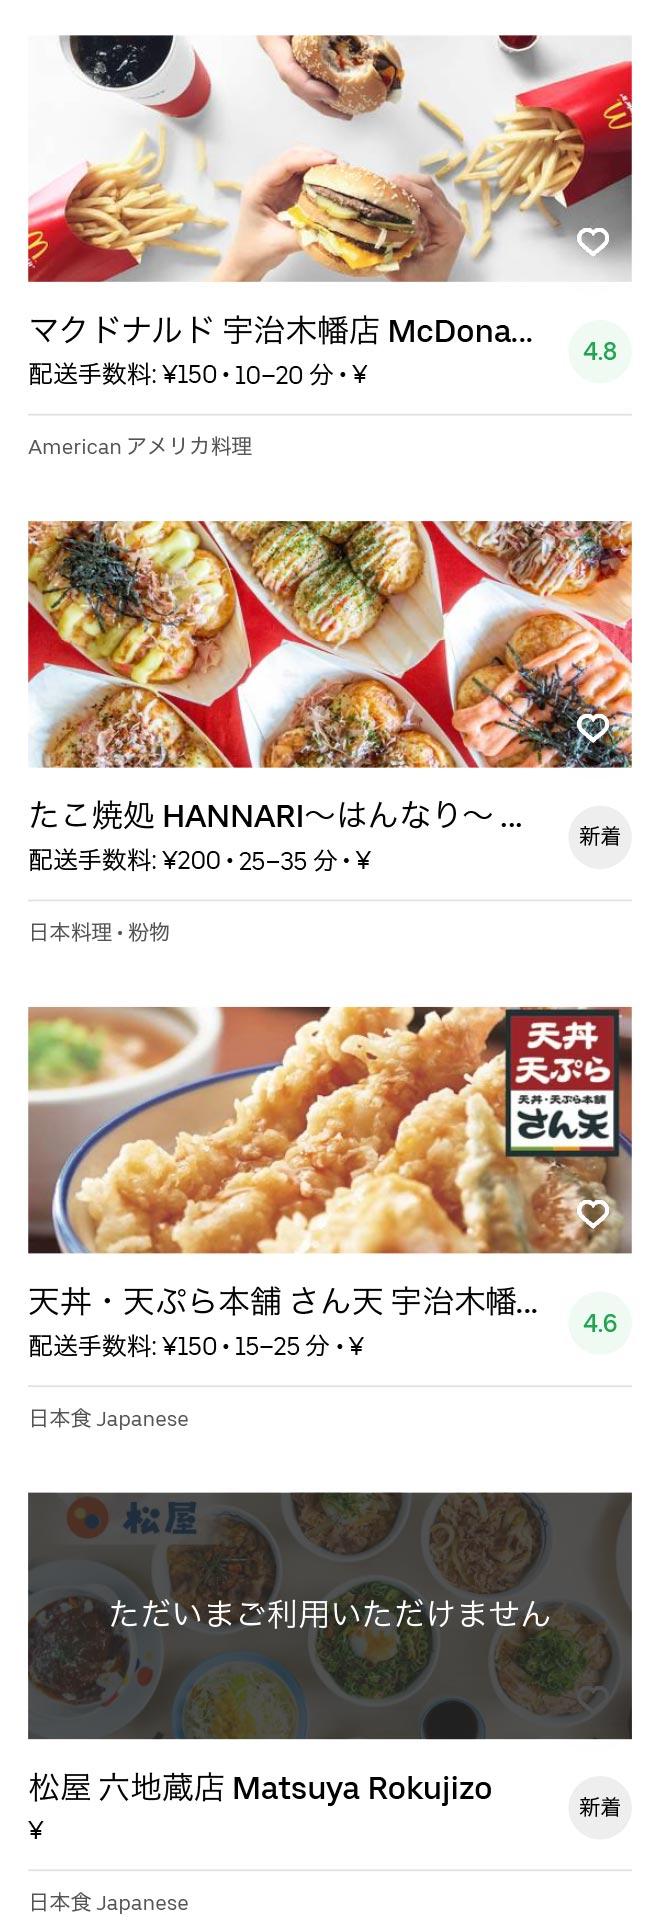 Uji rokujizo menu 2005 04